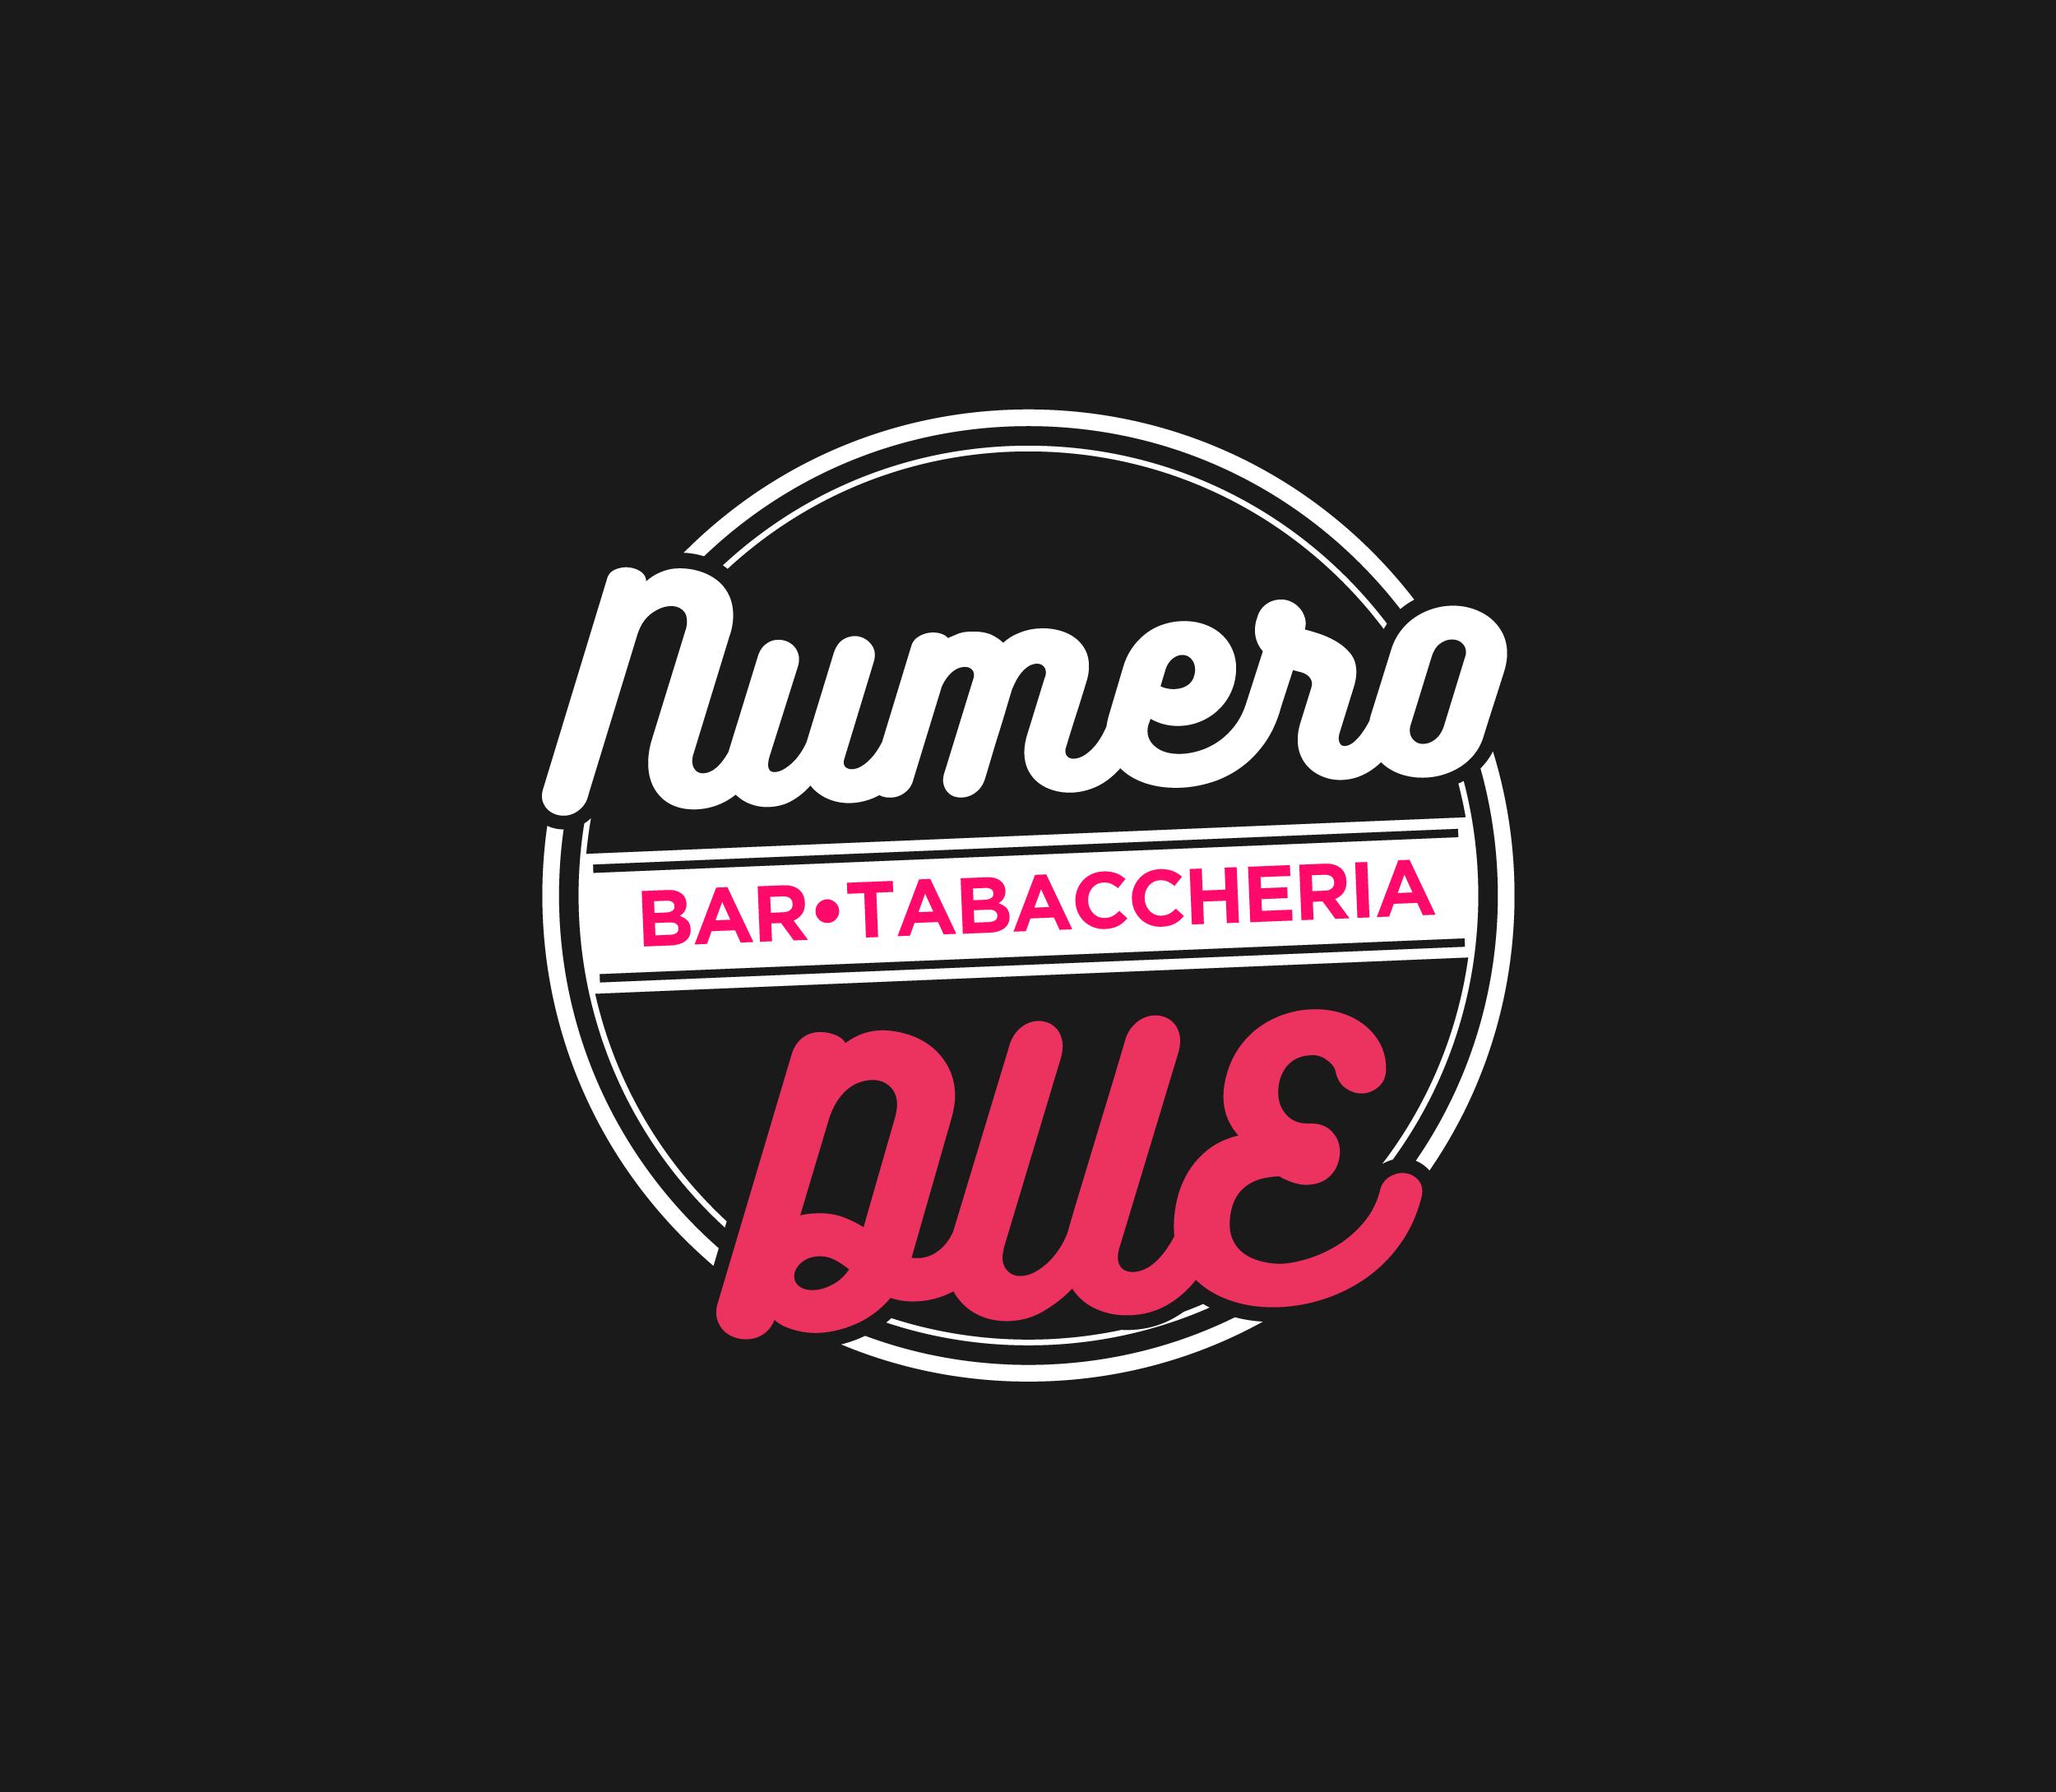 tabaccheria-numero-due-logo